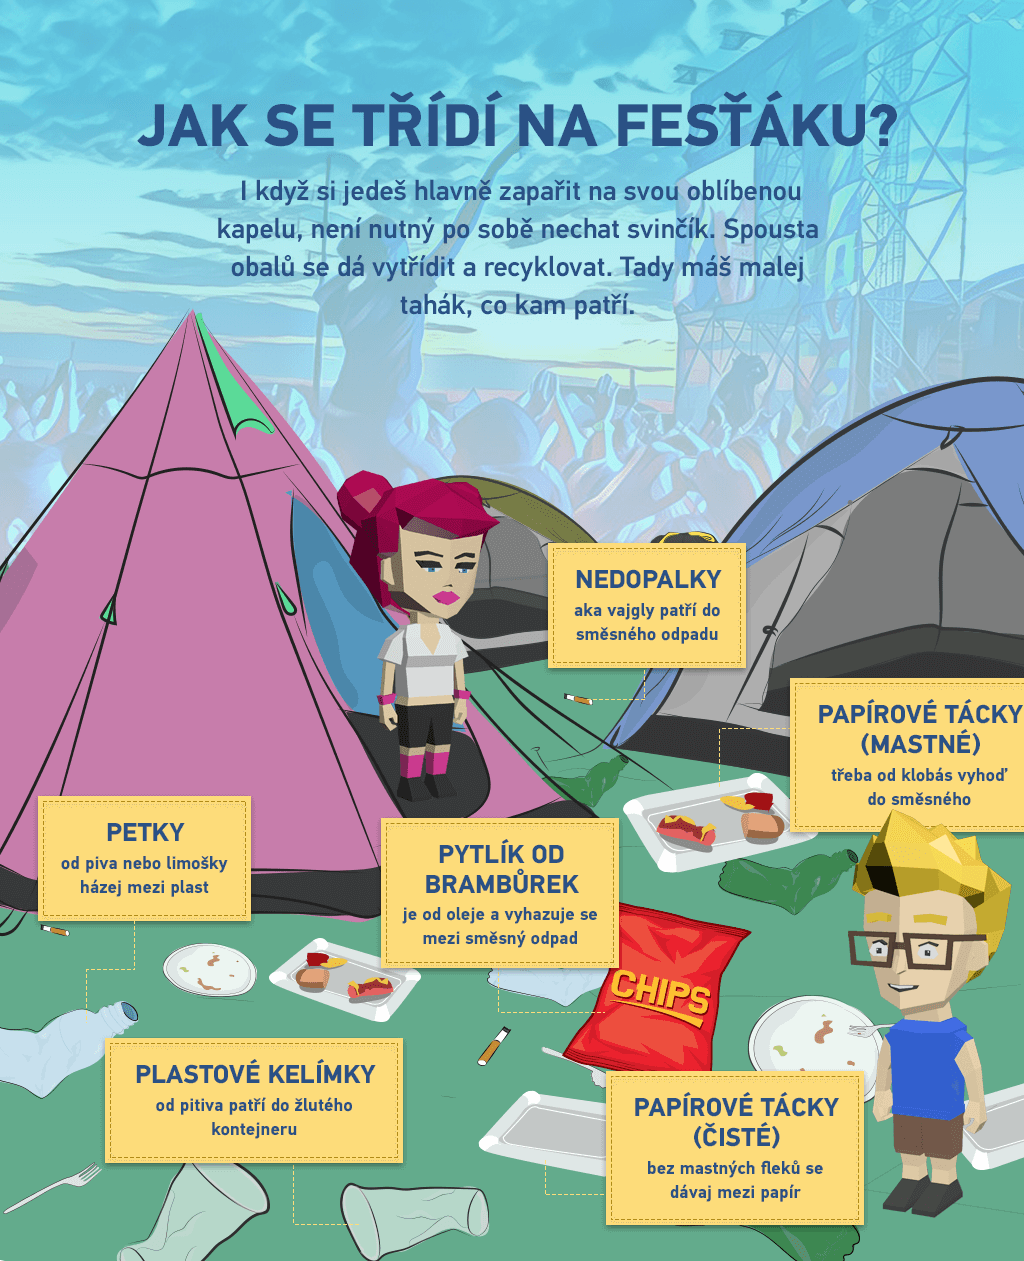 festival_festivaly_trideni_samosebou_odpad_plastove_kelimky_papirove_tacky_nedopalky_pet